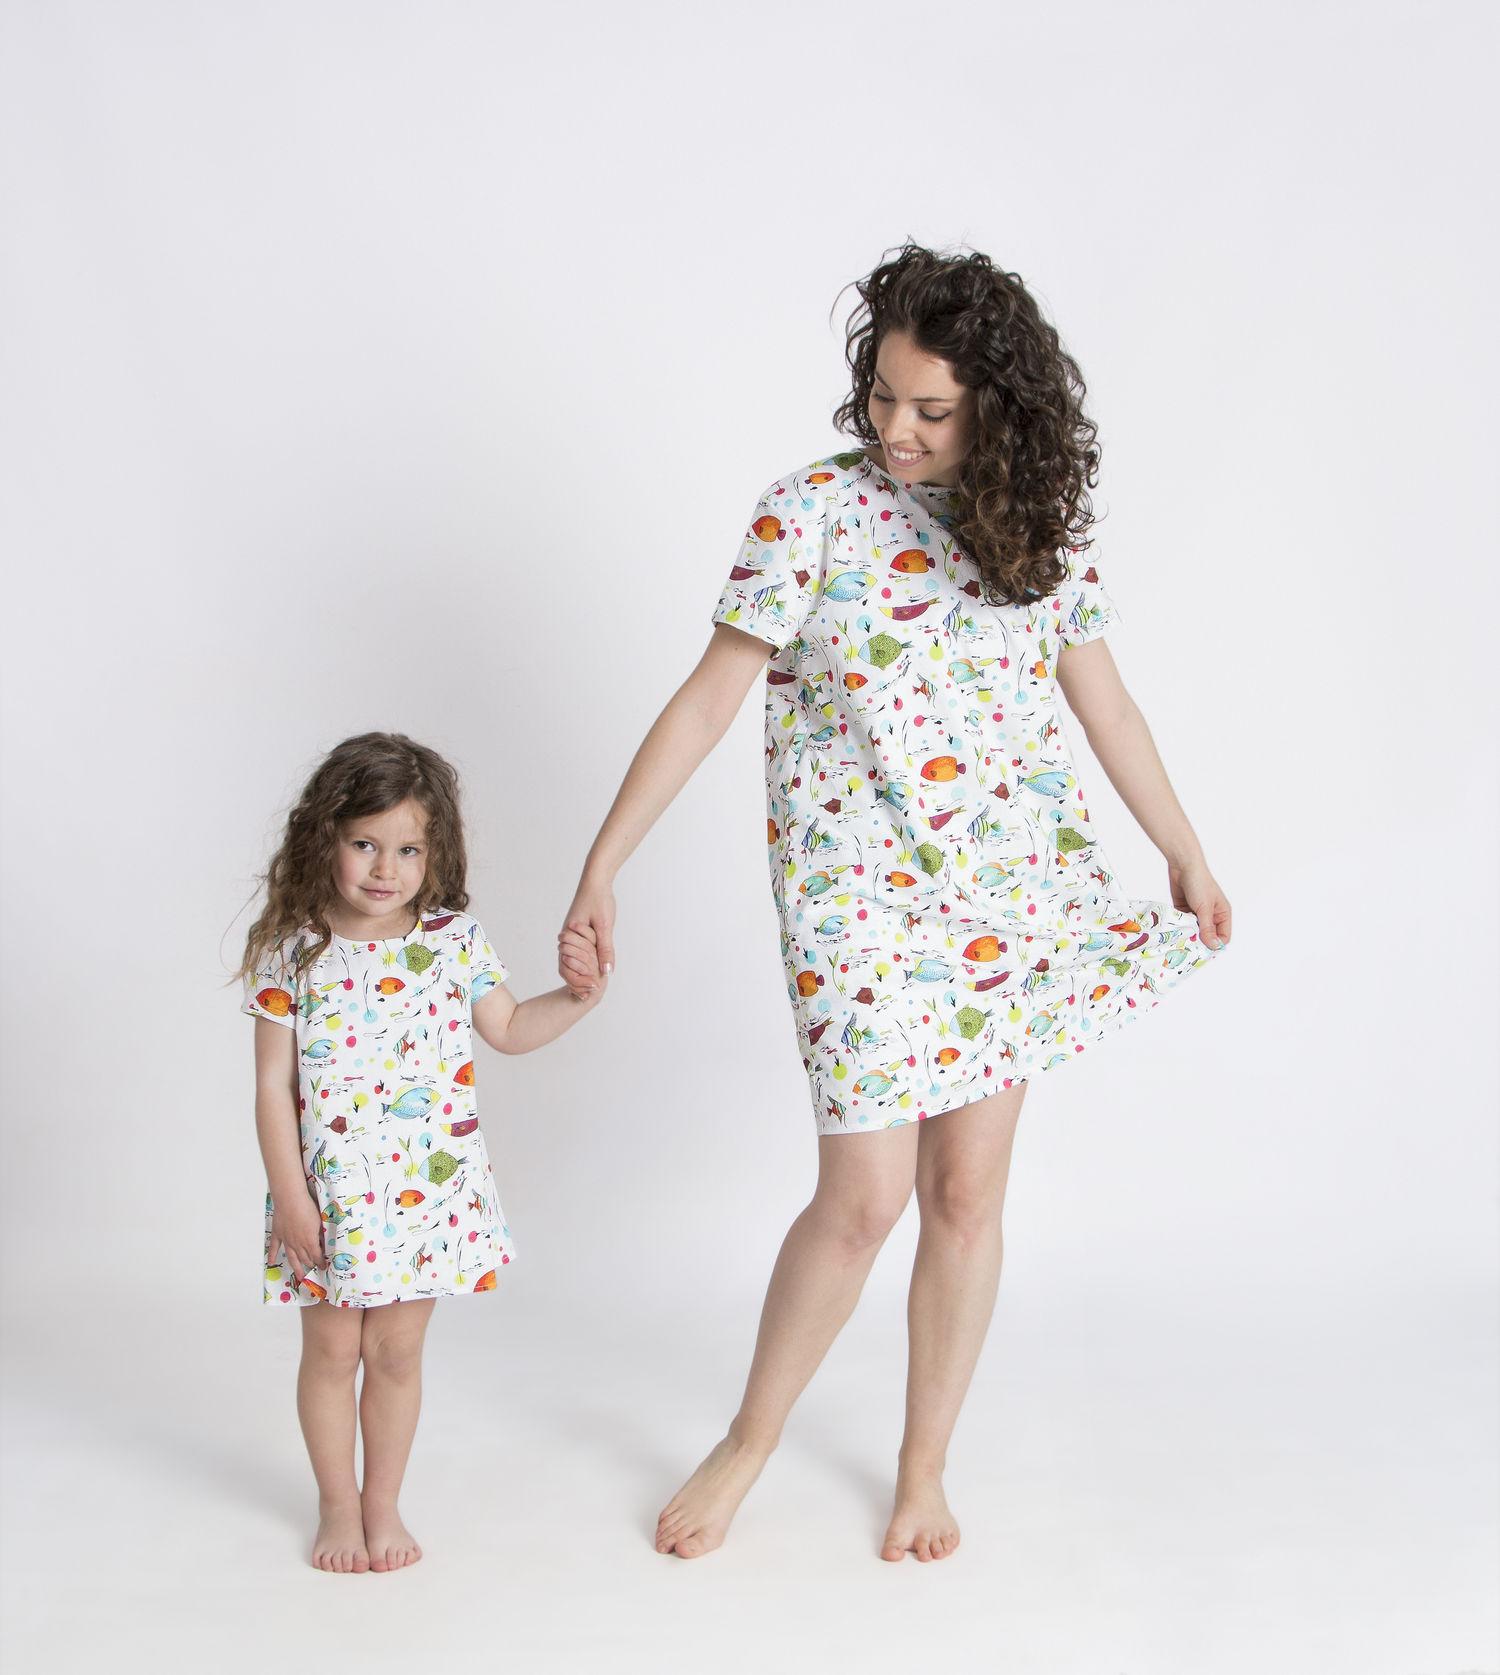 madre+e+hija+iguales_vestido_peces.jpg